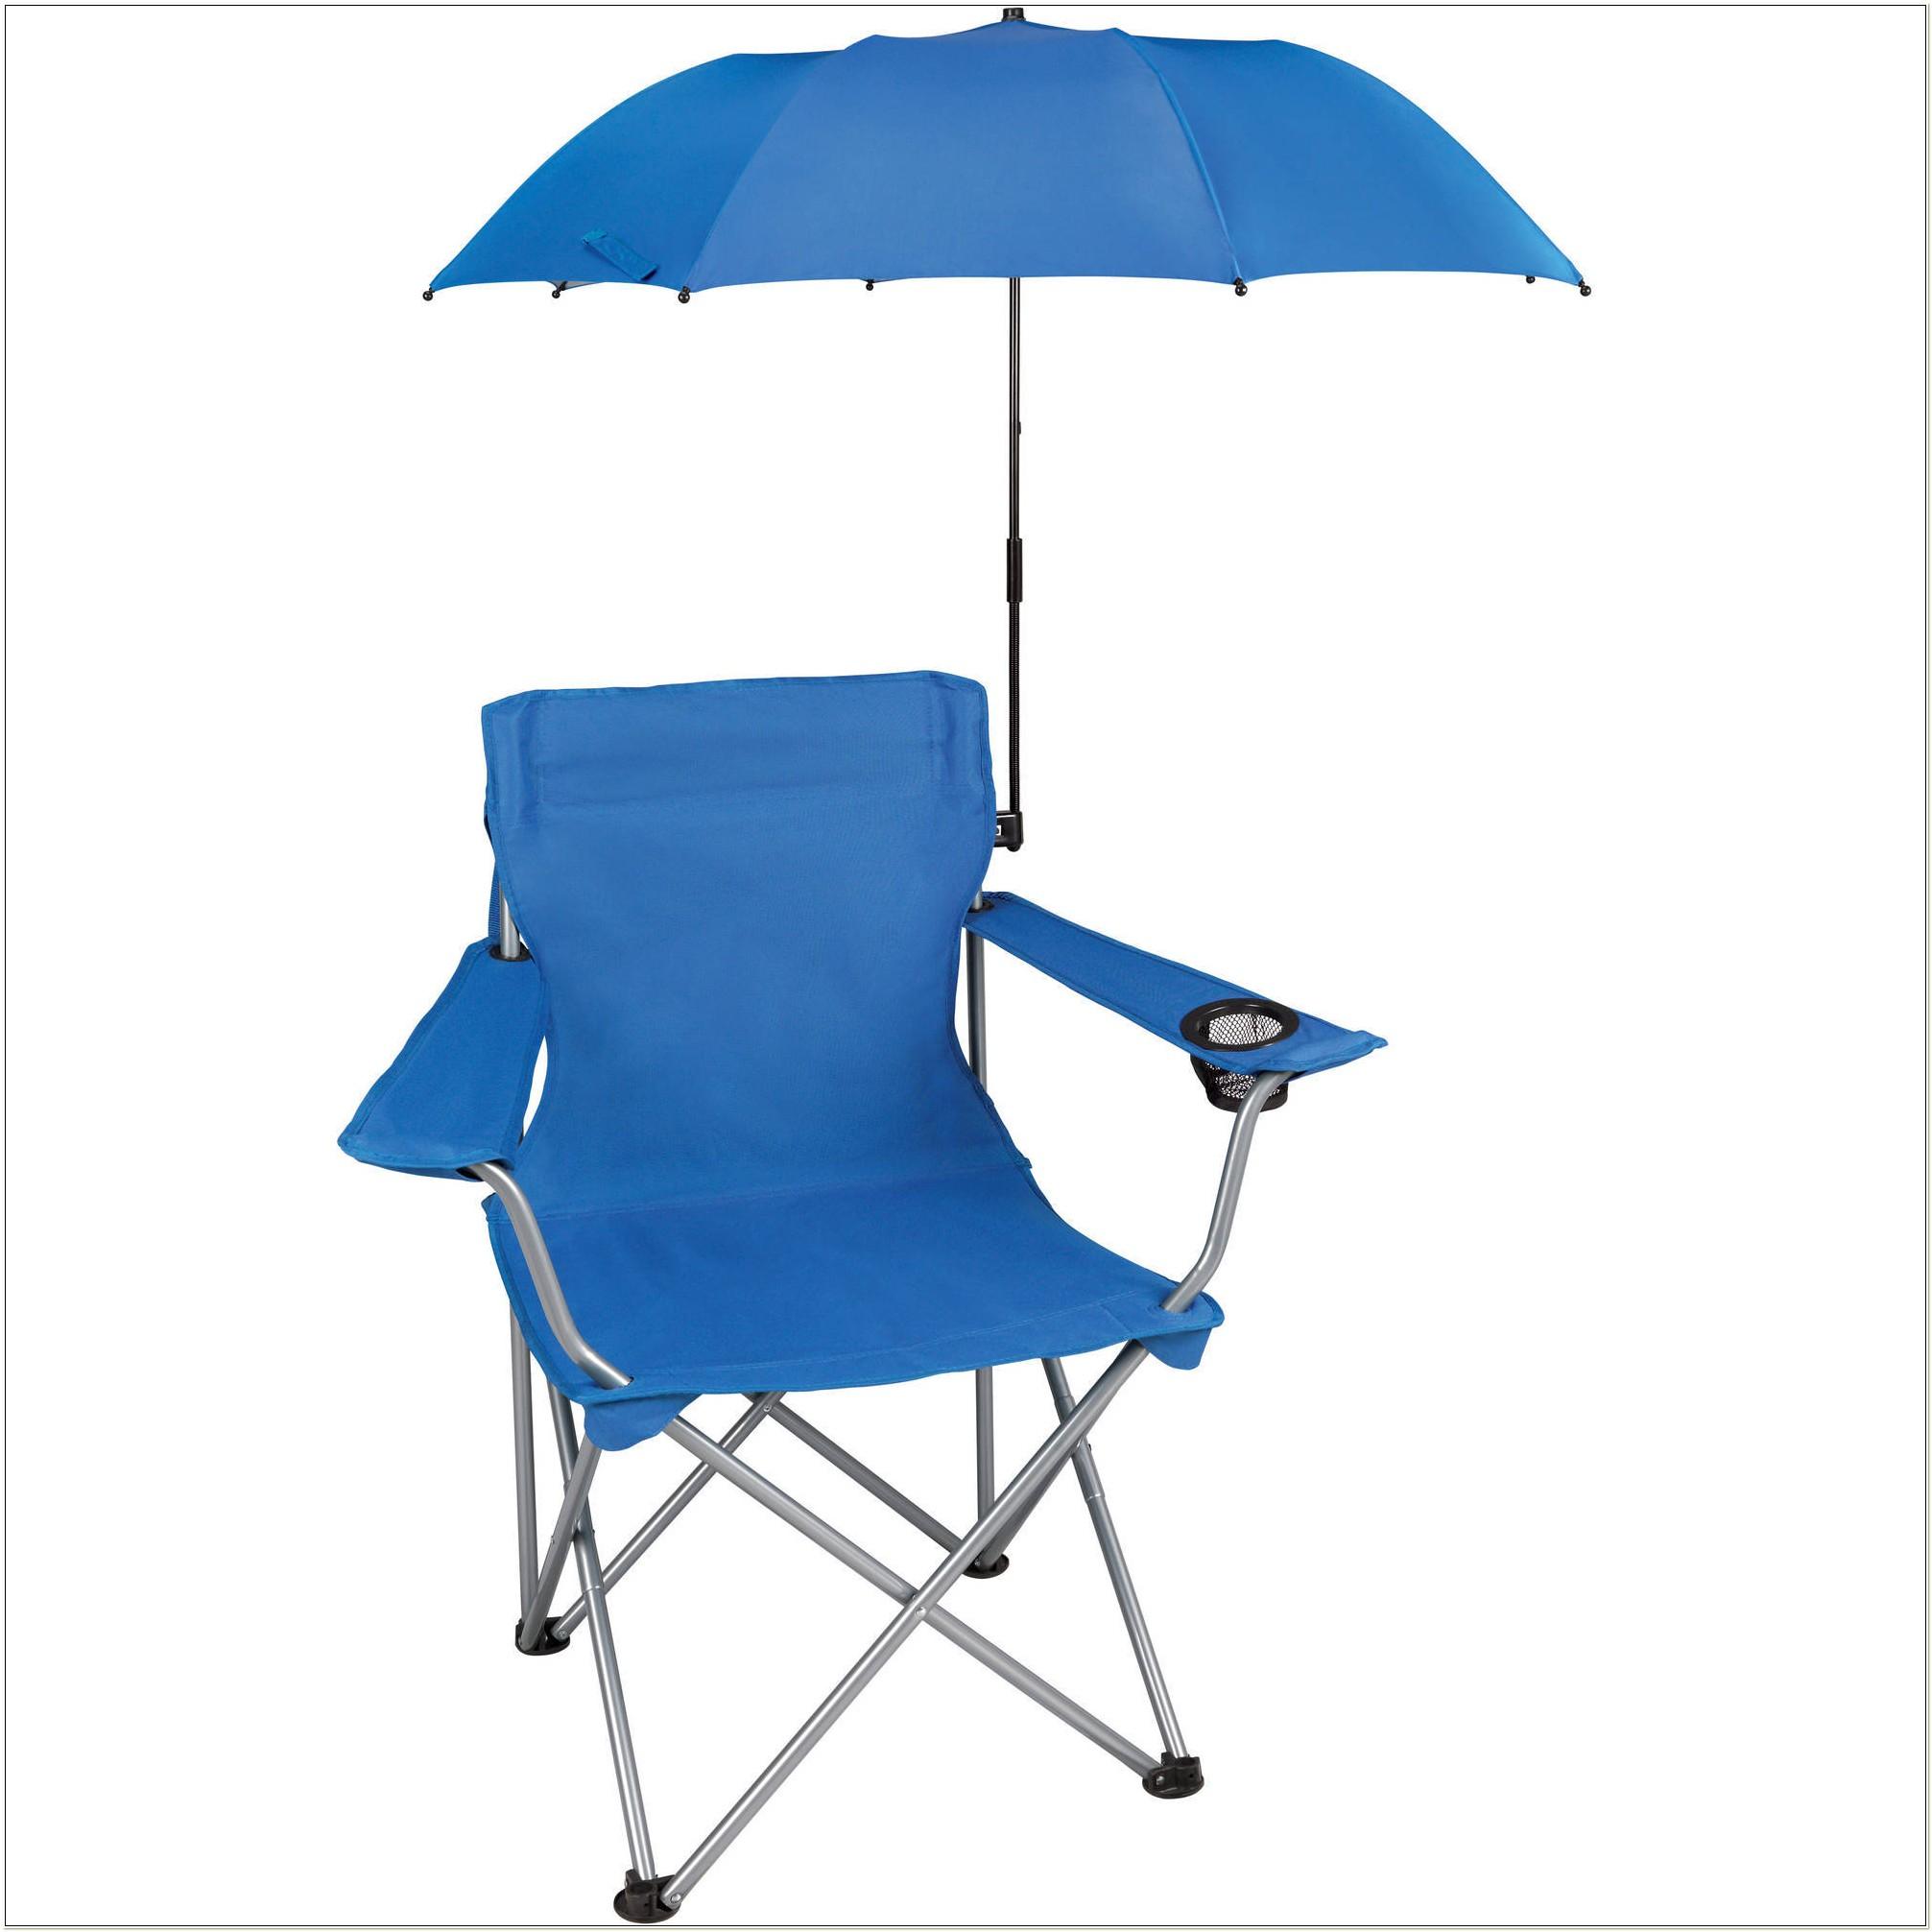 Clamp On Chair Umbrella Walmart